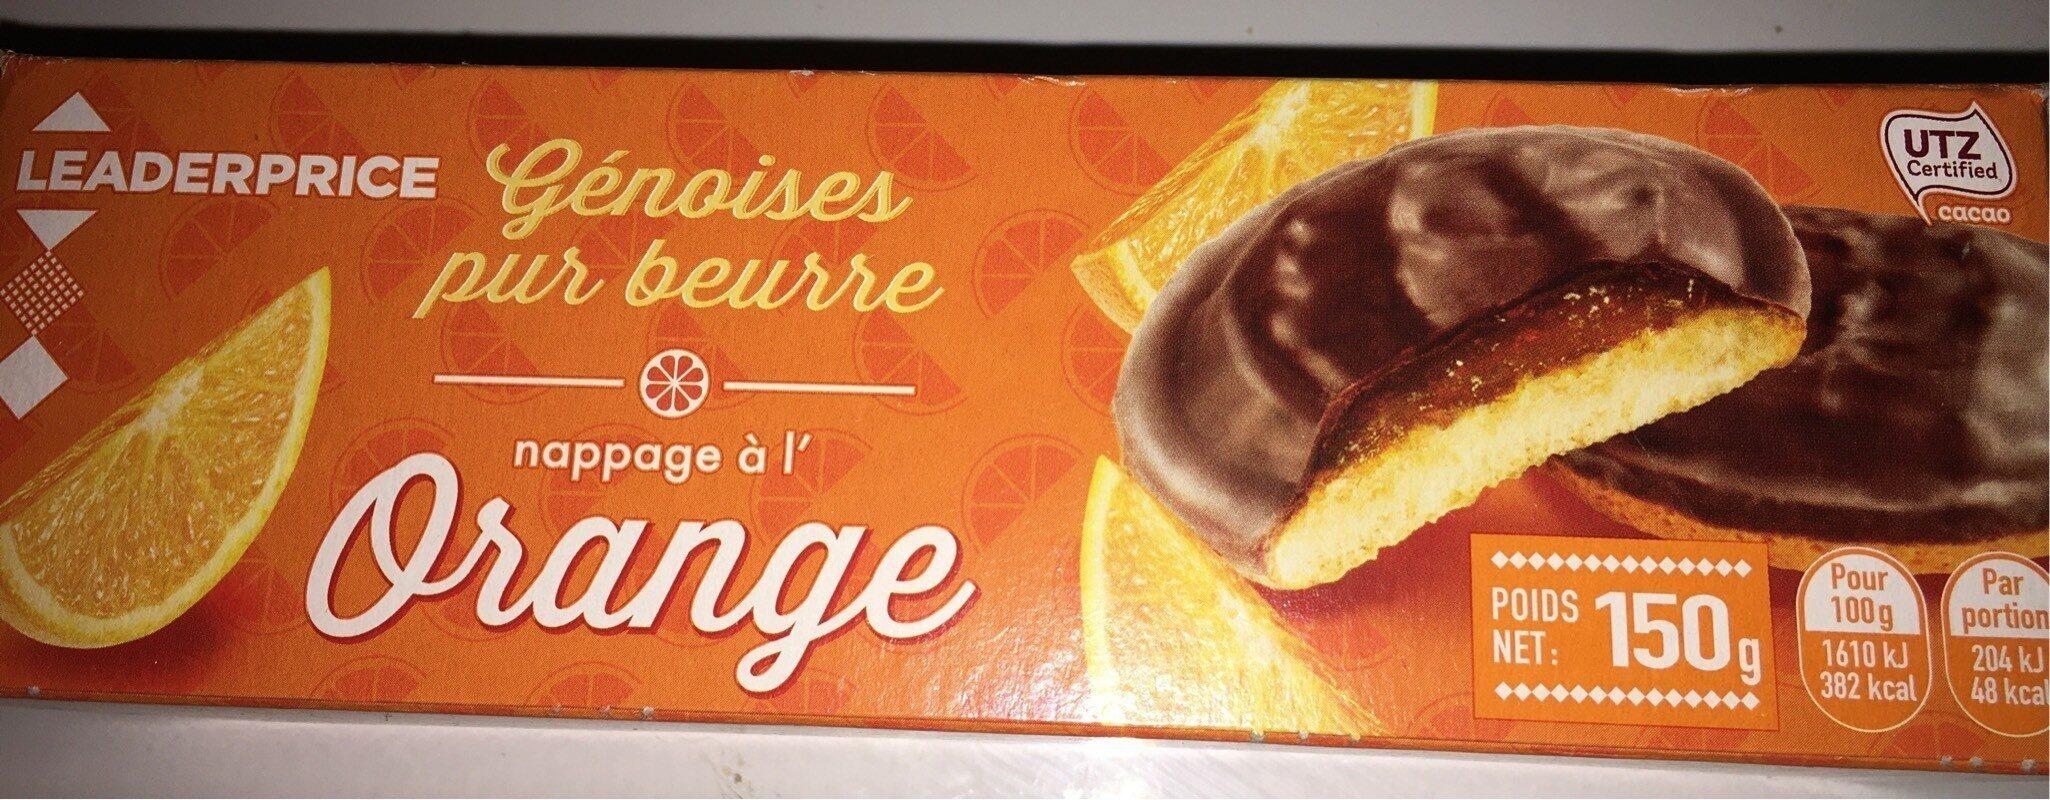 Genoise pur beurre orange - Product - fr